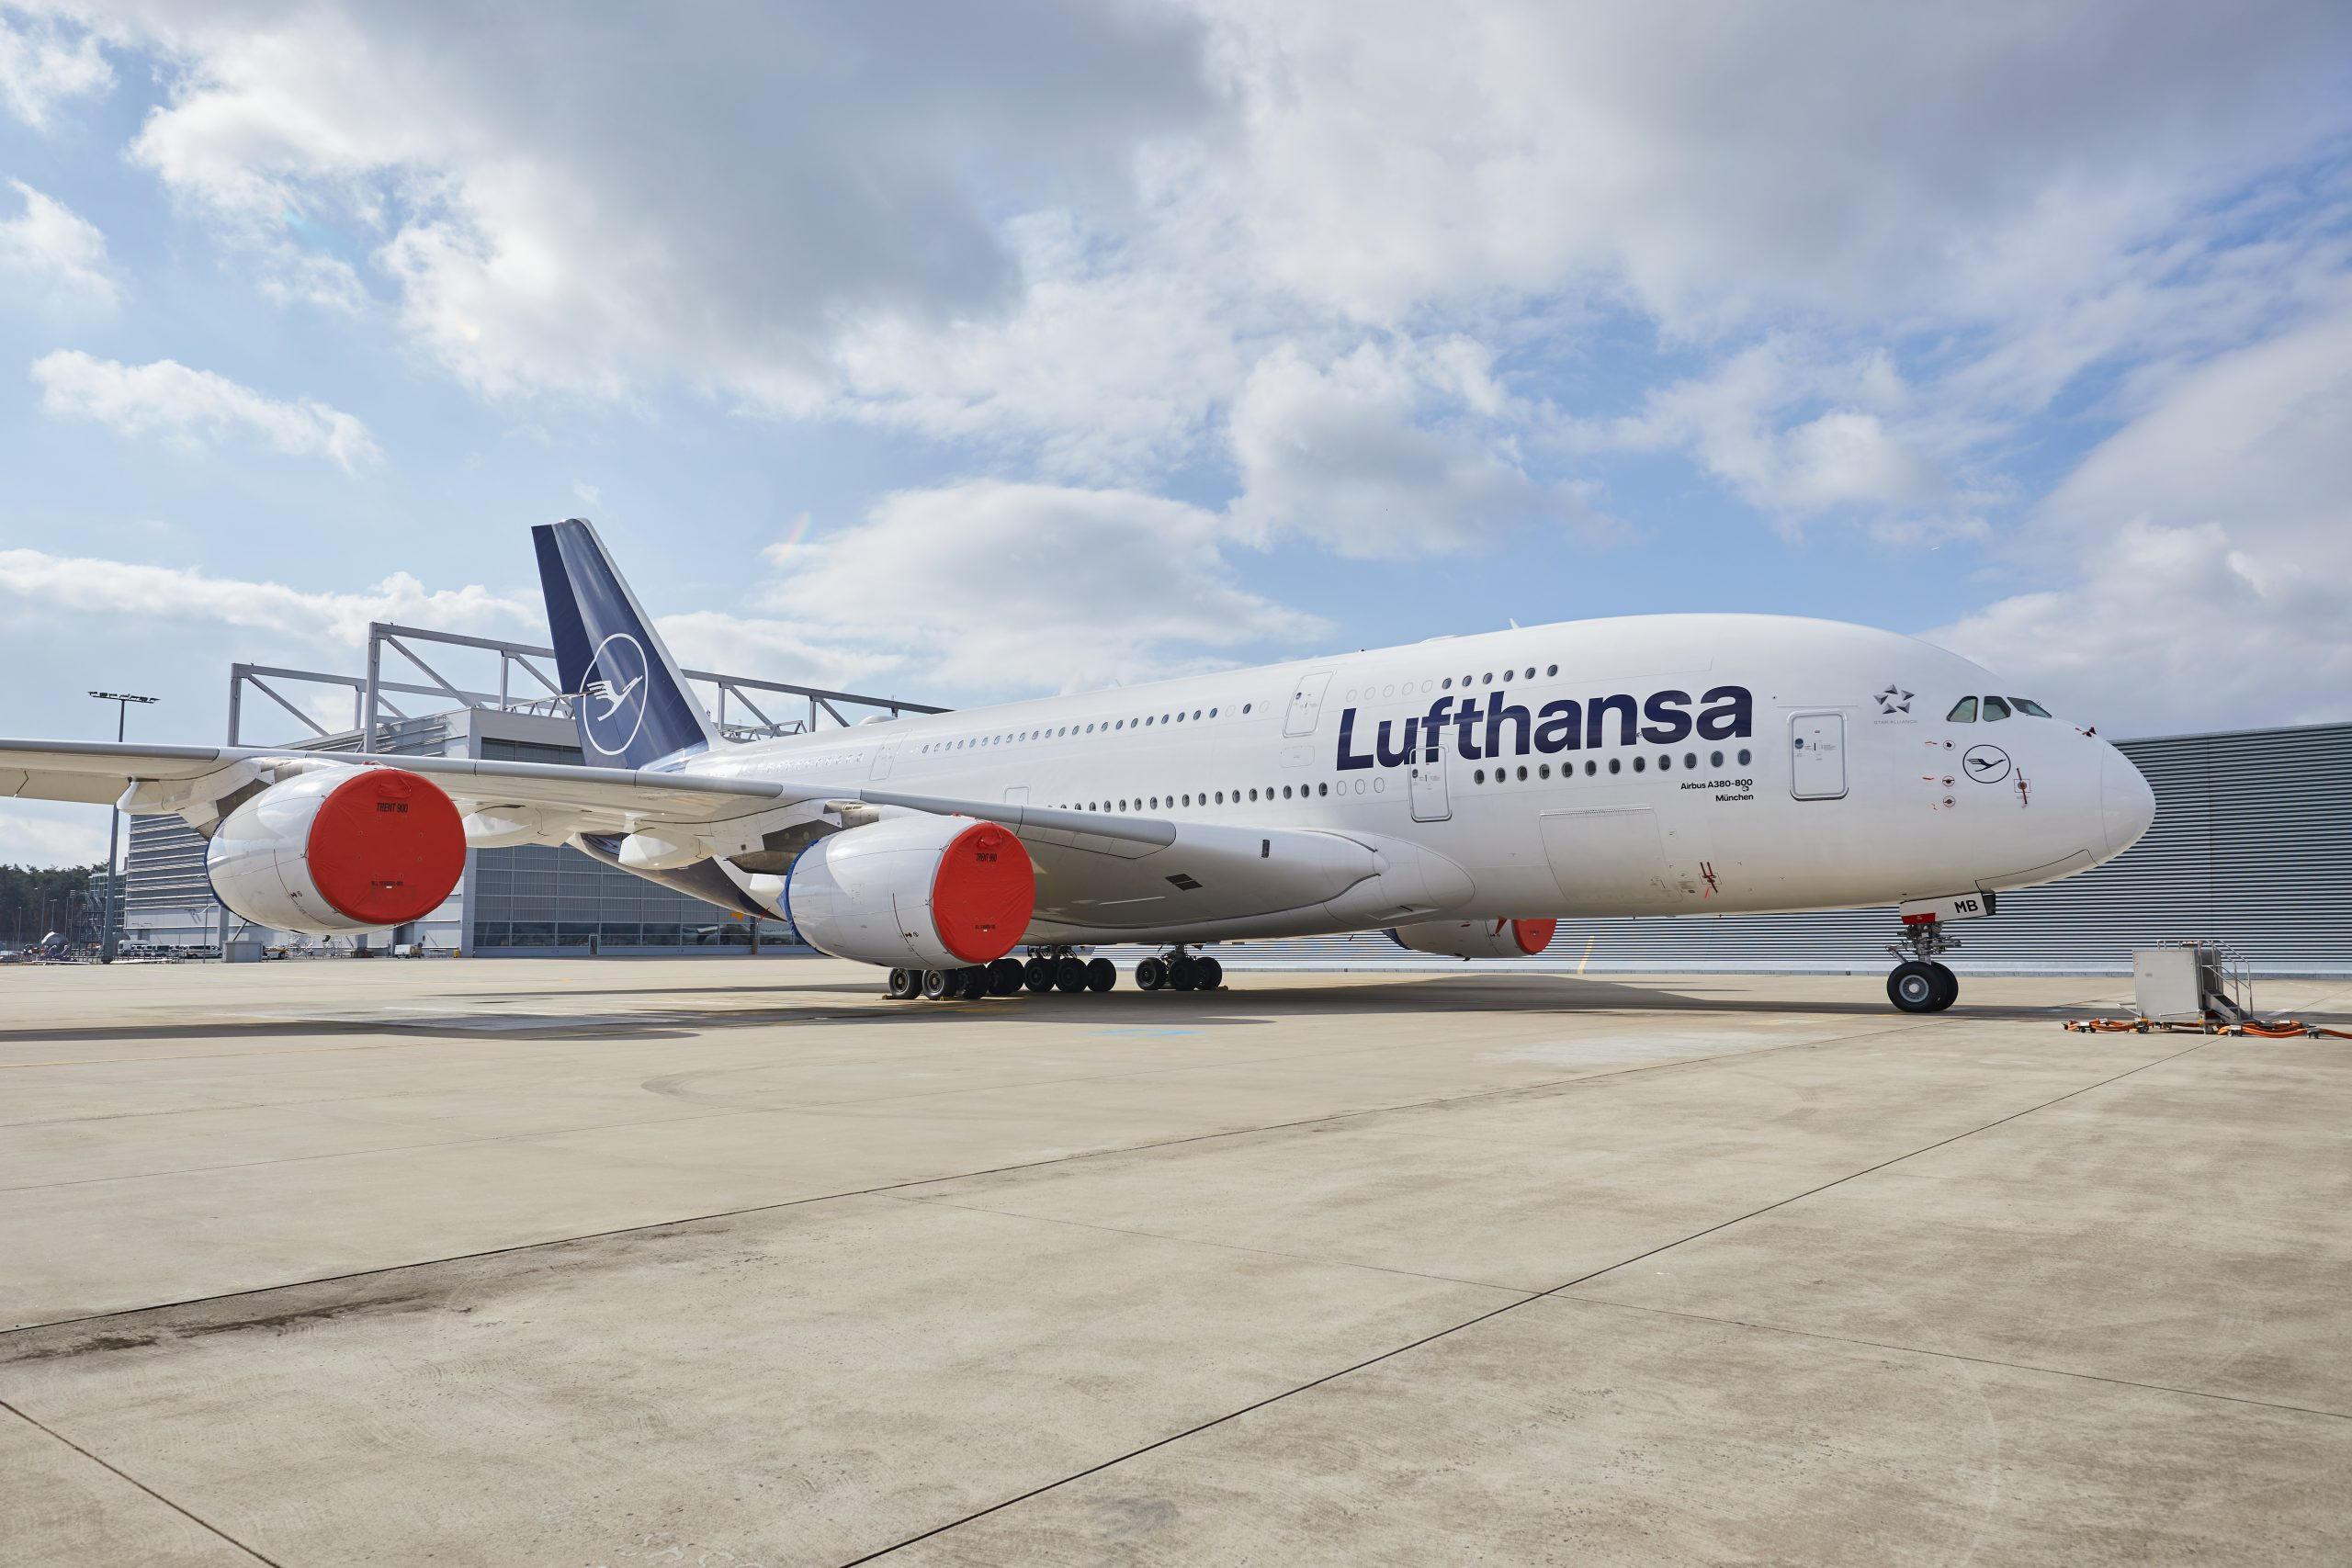 Lufthansa plane at Frankfurt Airport